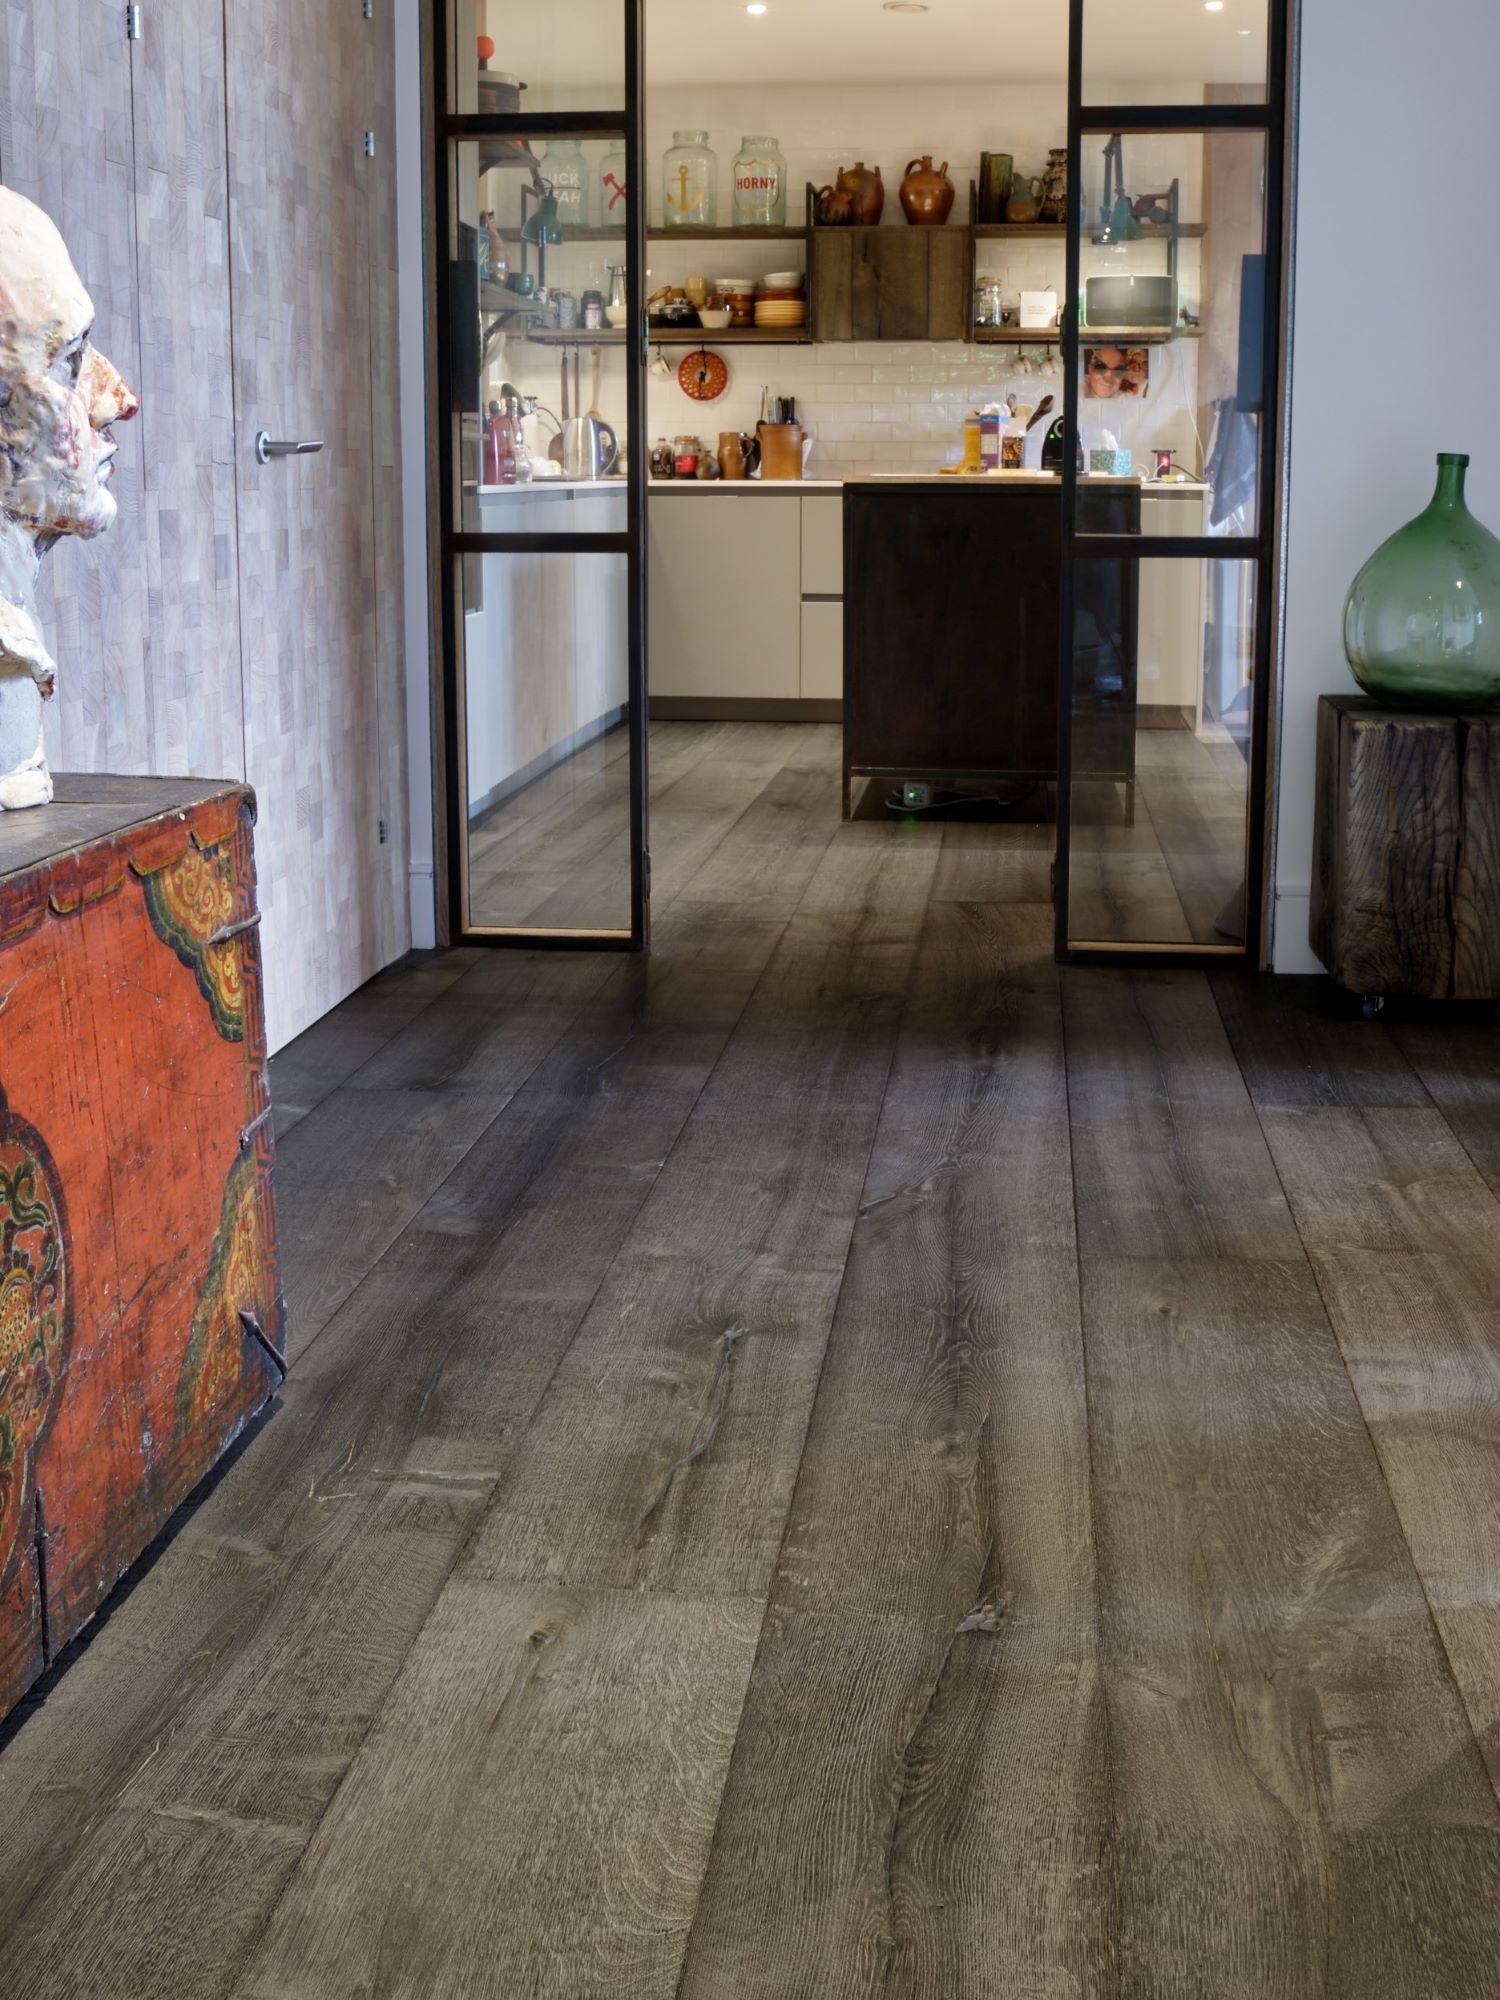 Magma mayon dark textured oak engineered flooring in hallway with kitchen in background and steel doors